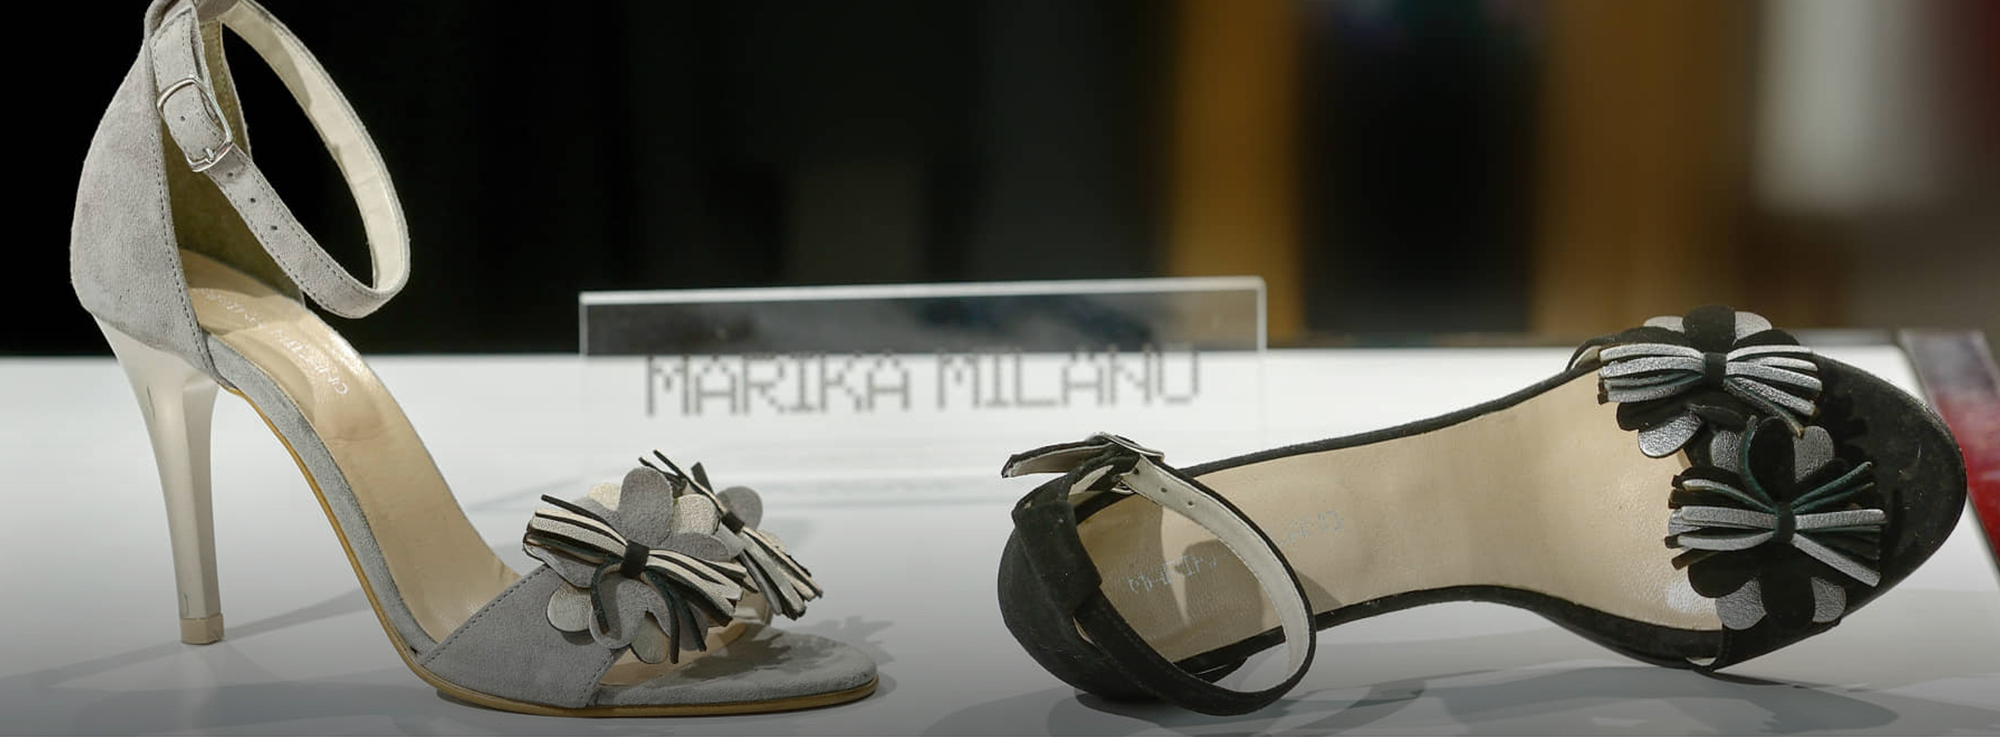 Marika Milano Barletta